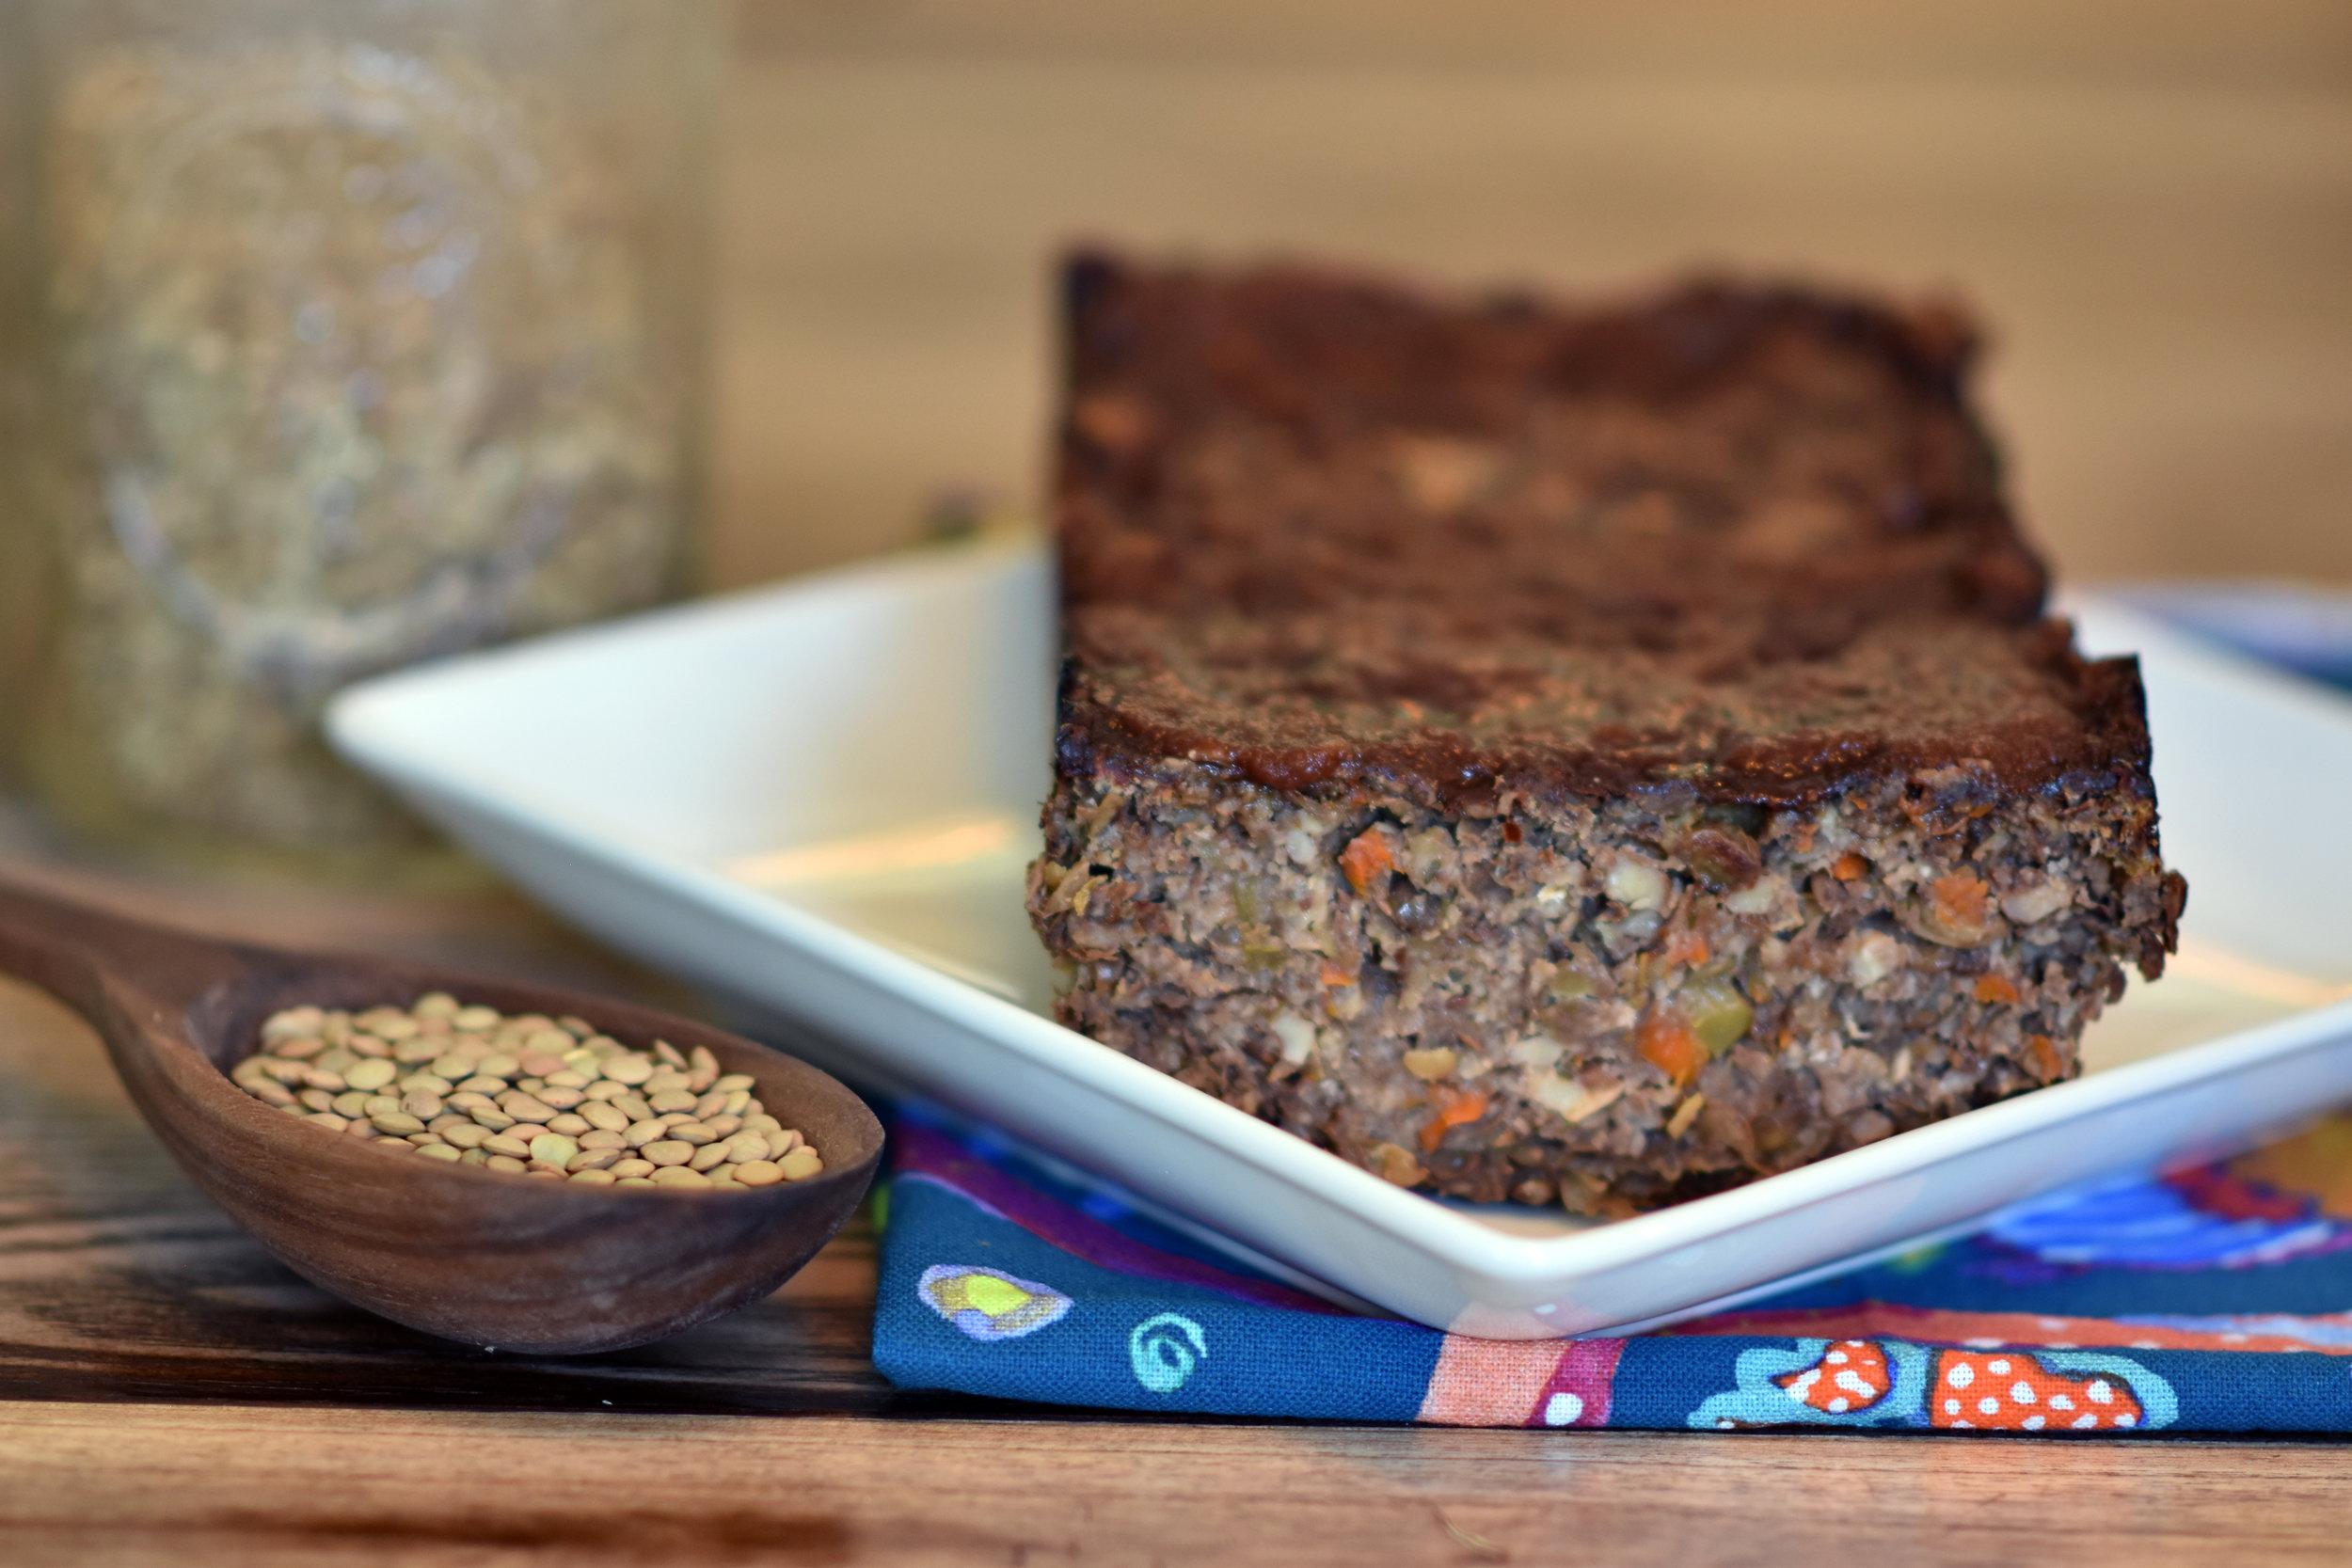 balsamic glazed lentil loaf - the antithesis to your mother's meatloaf